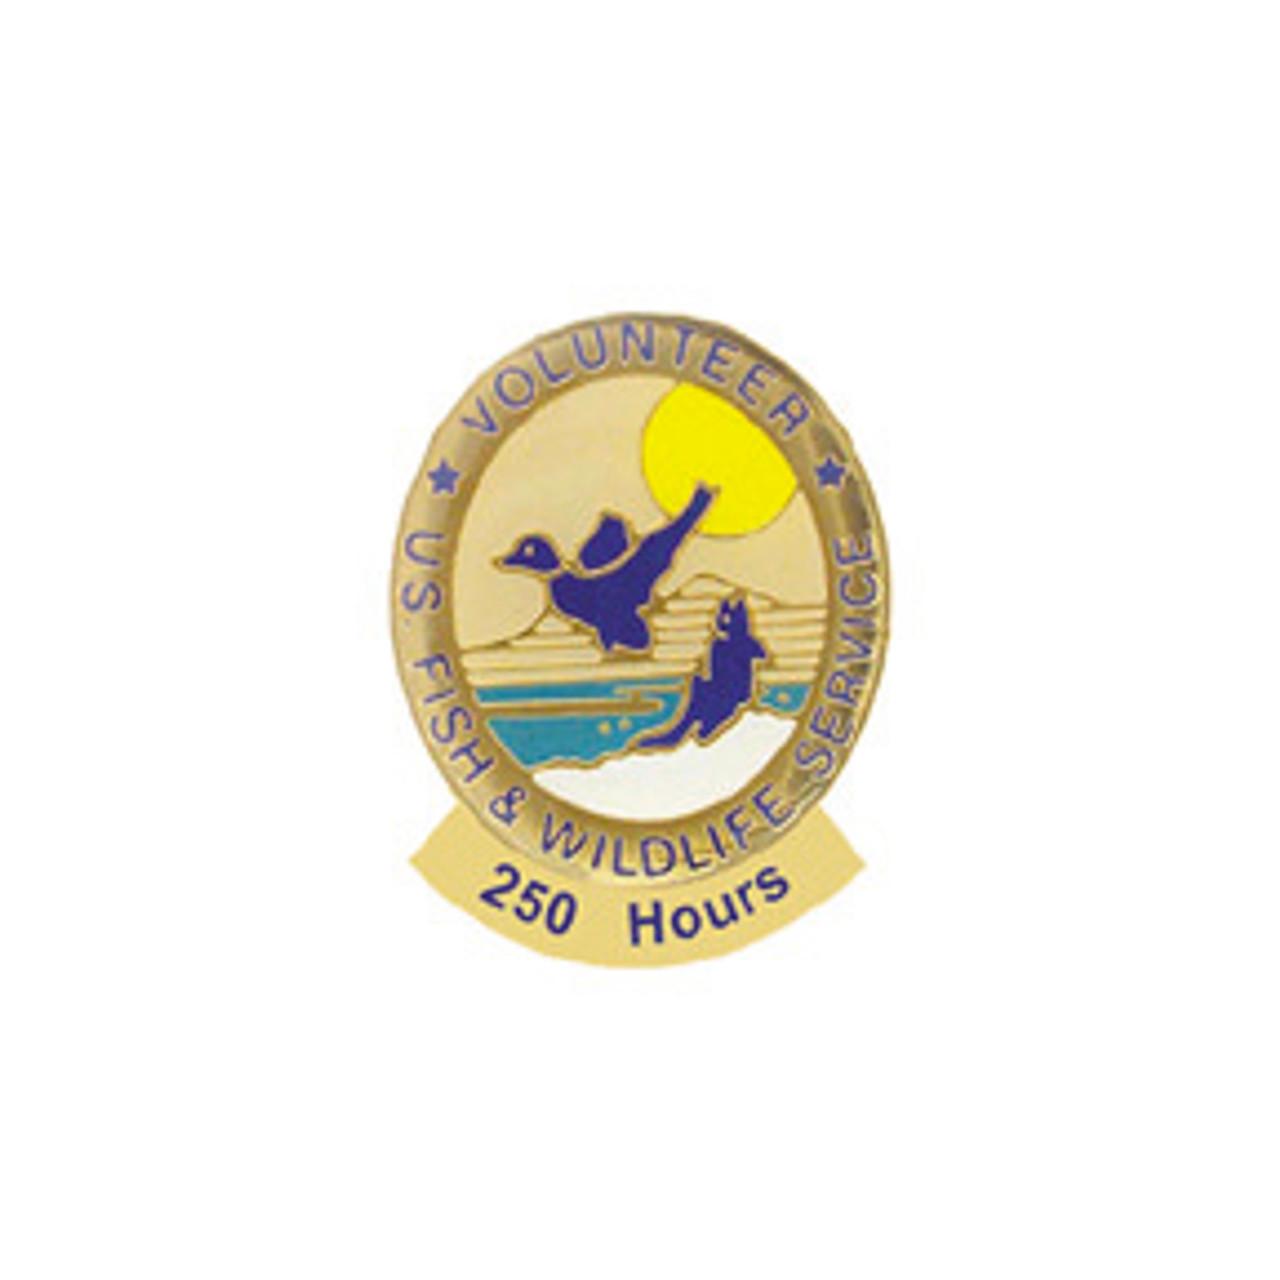 Fish & Wildlife Volunteer Hours Pin (2000 hours)